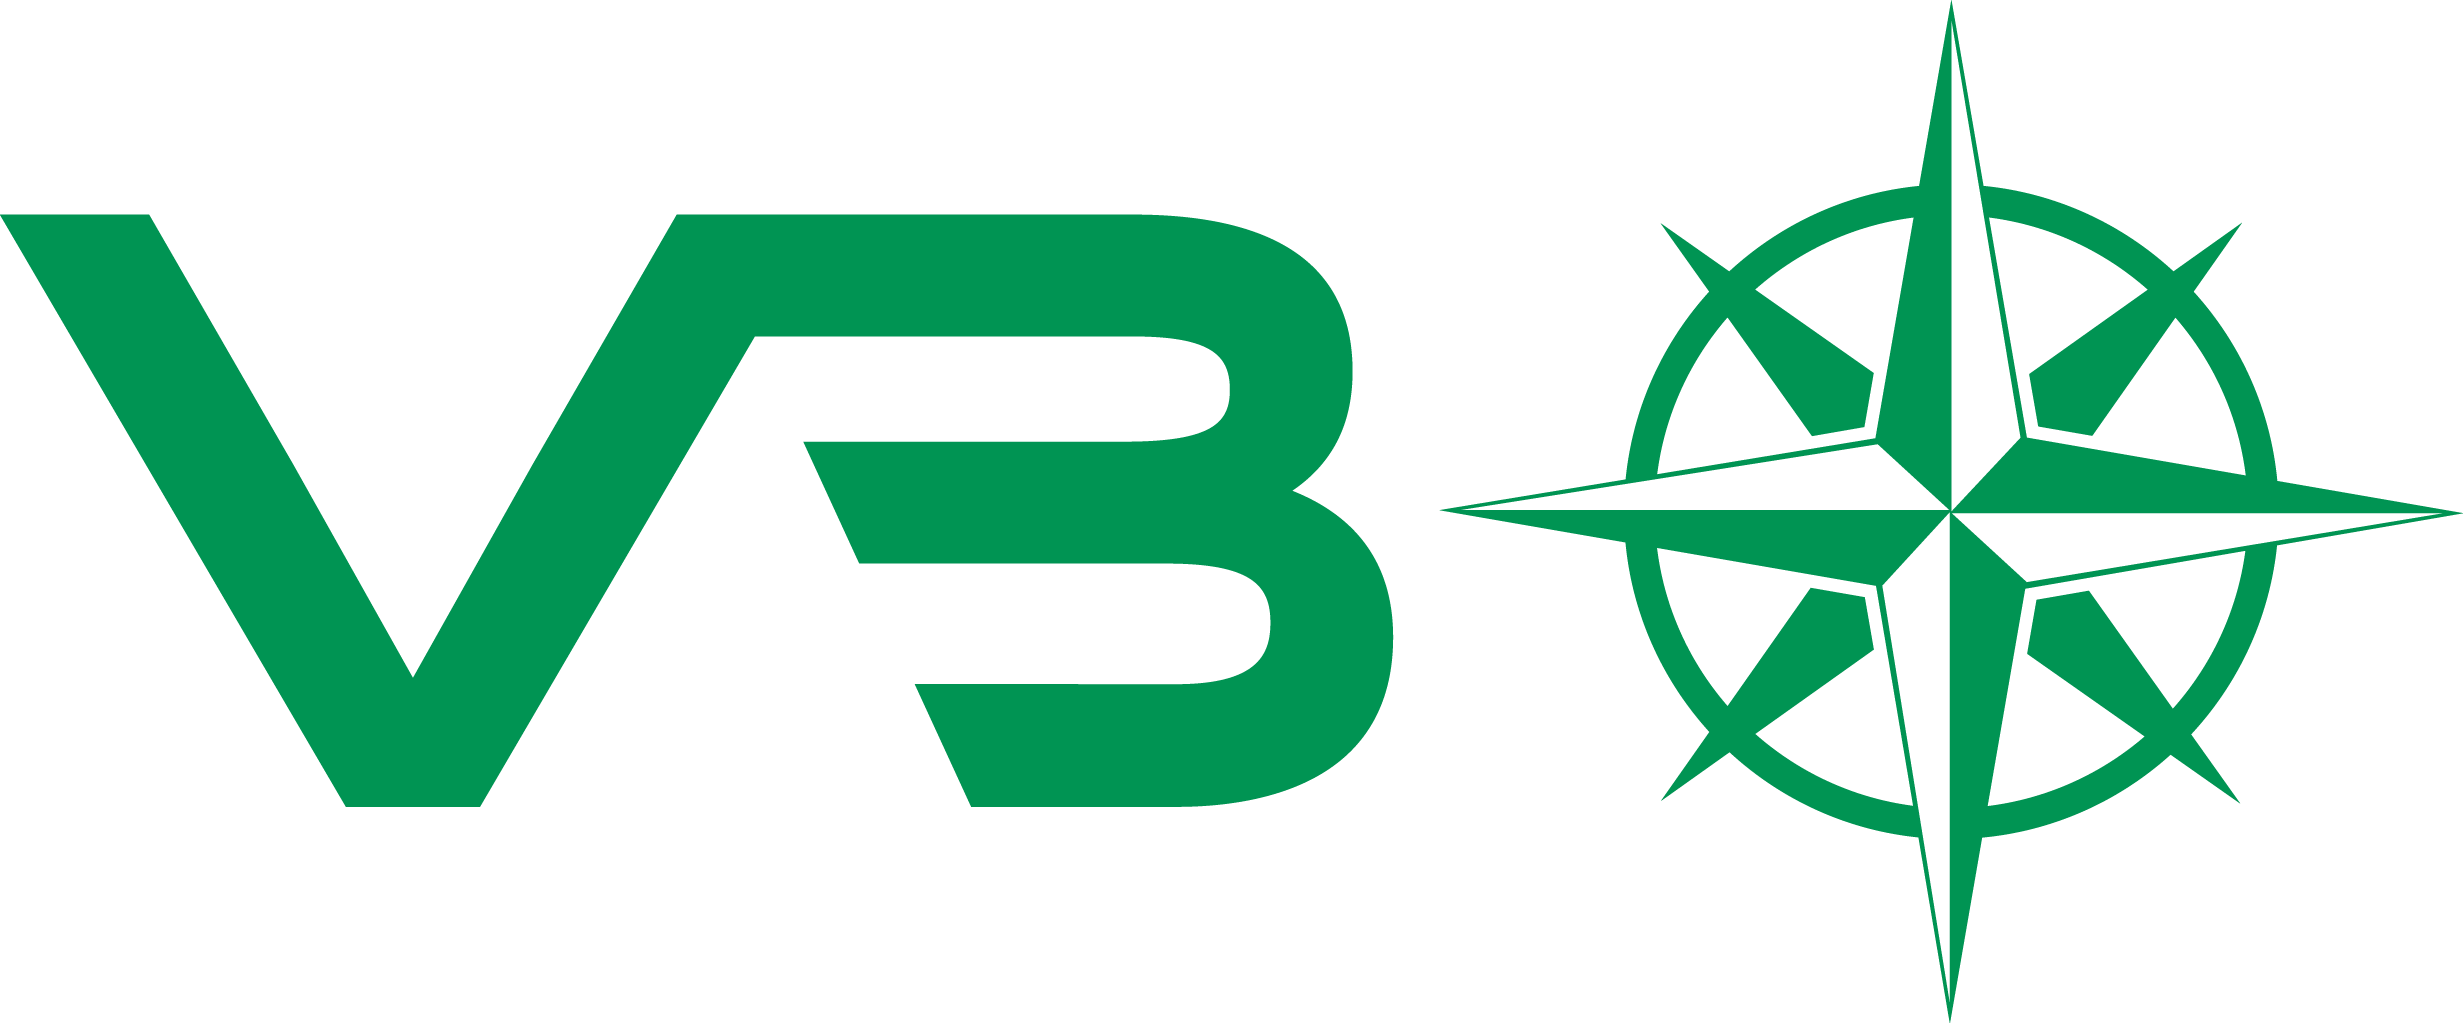 Vertom Bereederungs GmbH & Co. KG